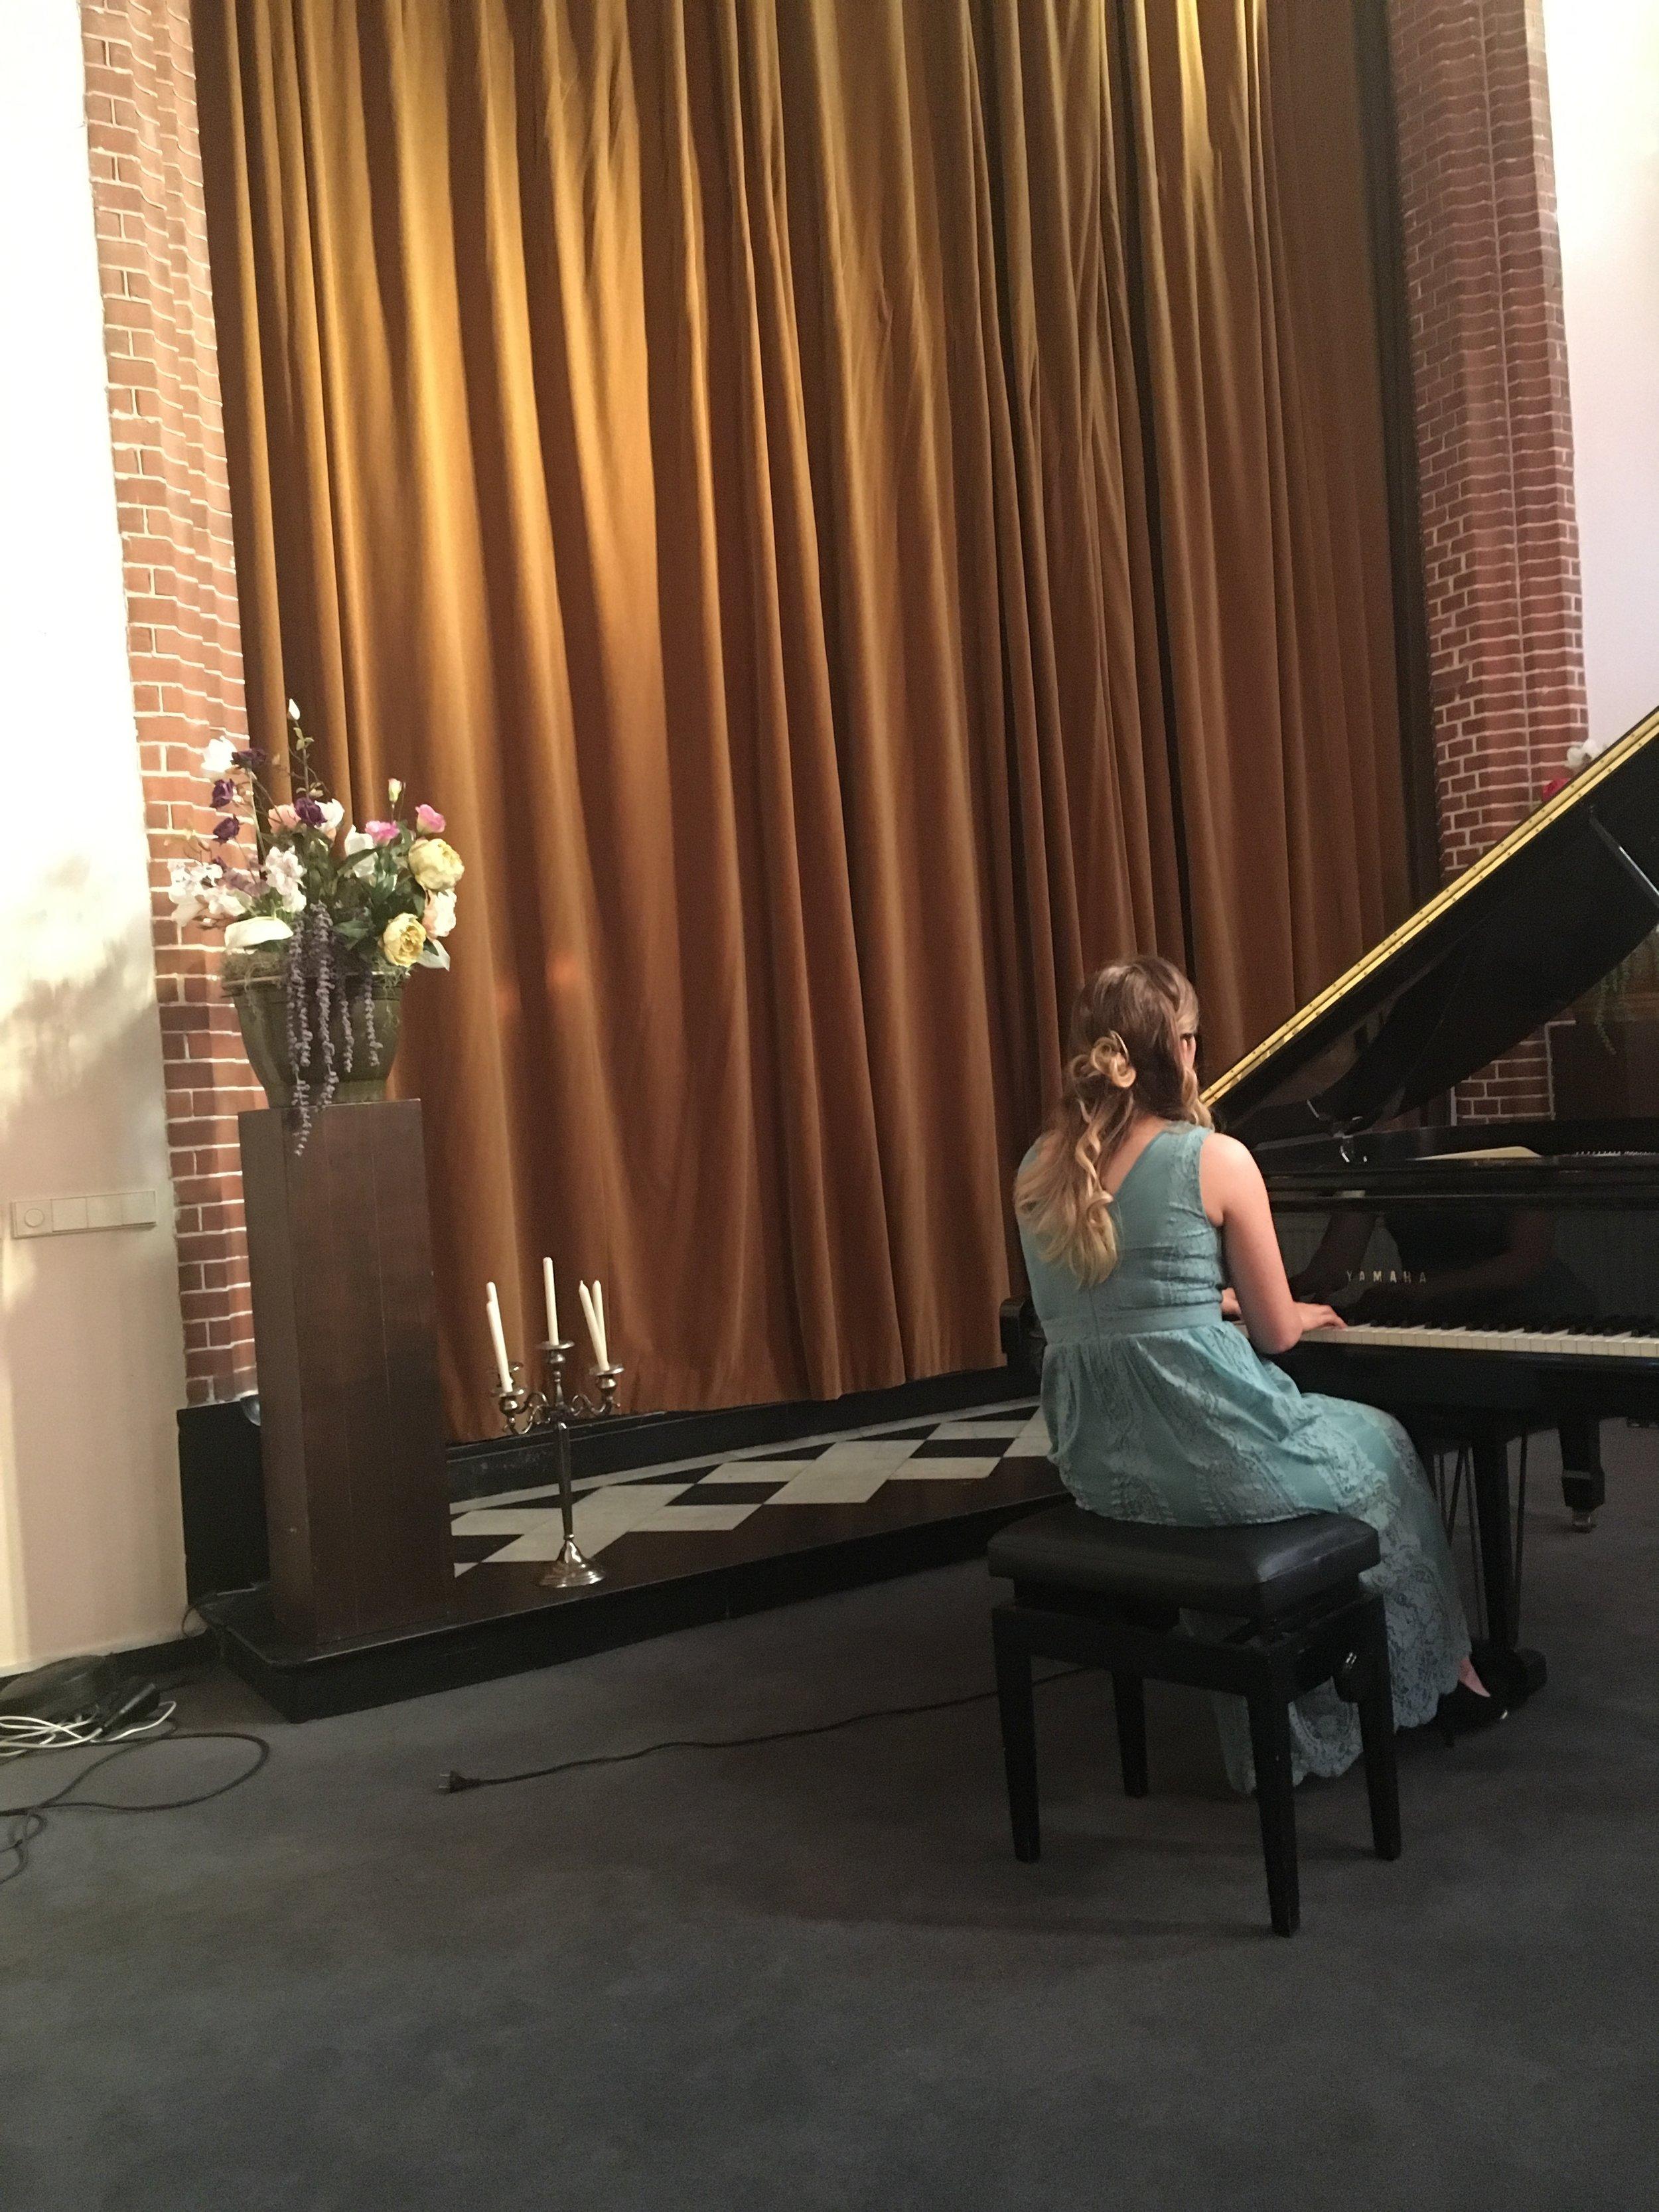 mid-Chopin